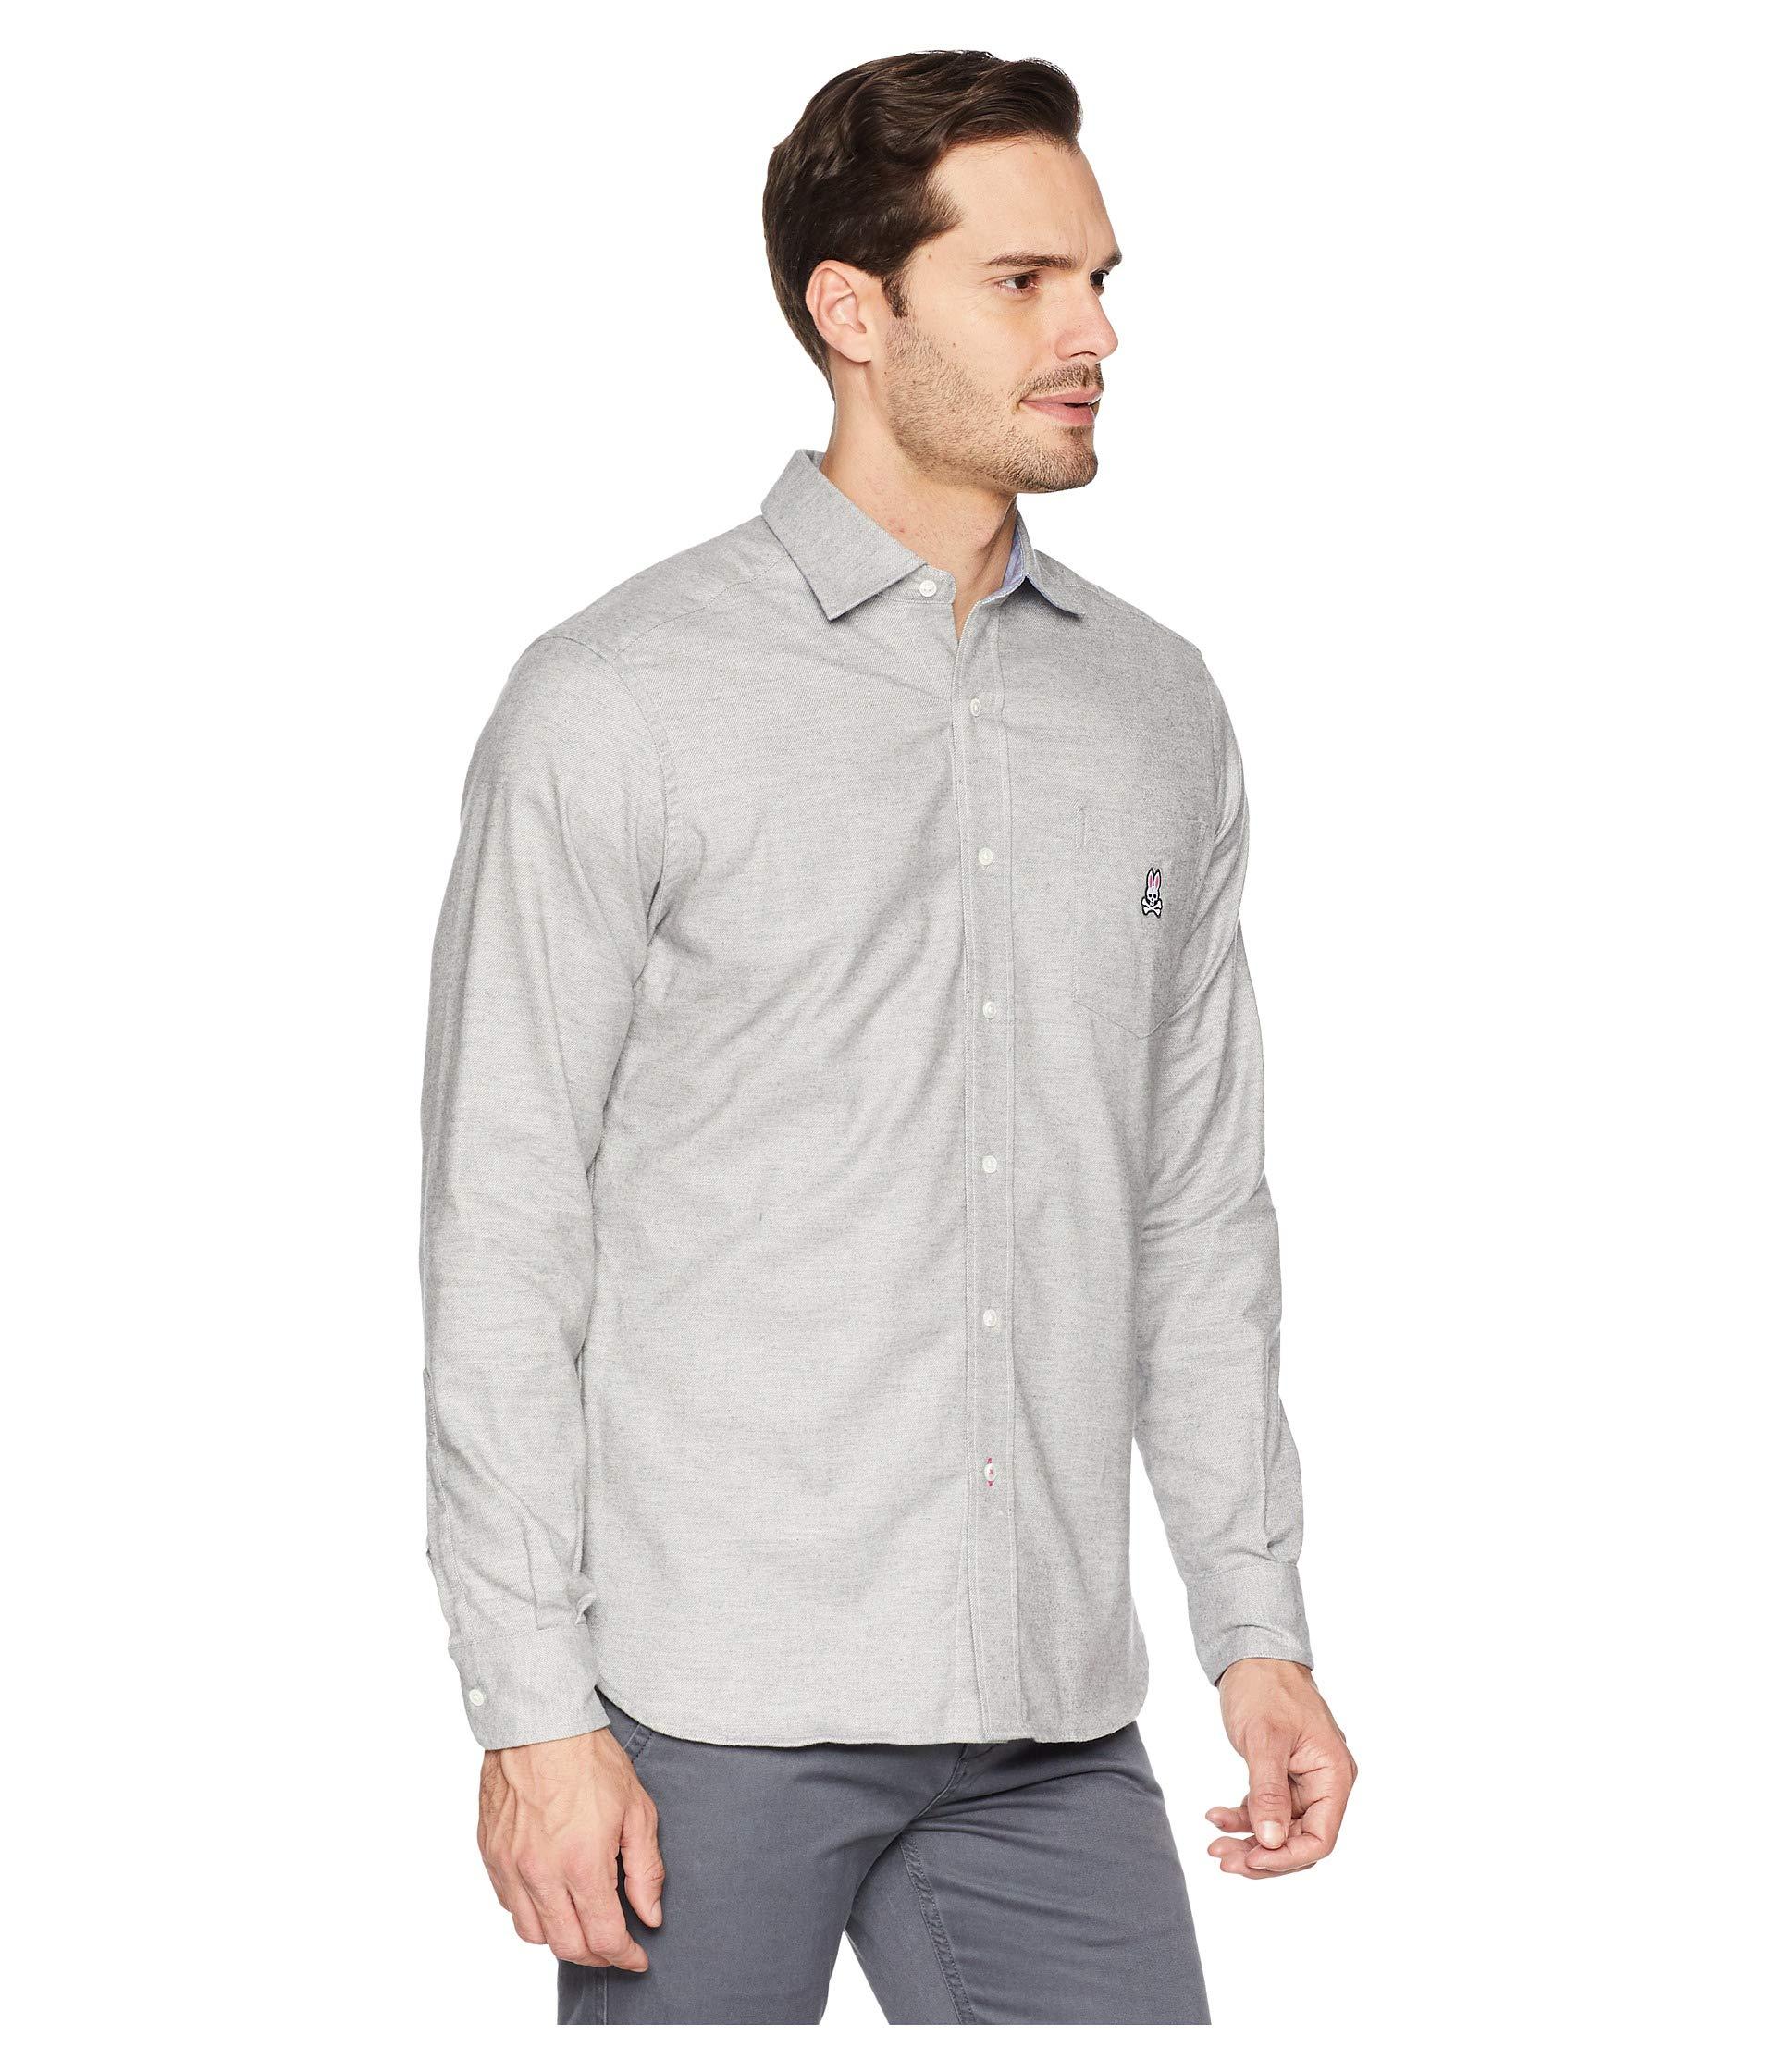 Heather Flannel Sleeve Bunny Shirt Psycho Grey Long nCX4wStq